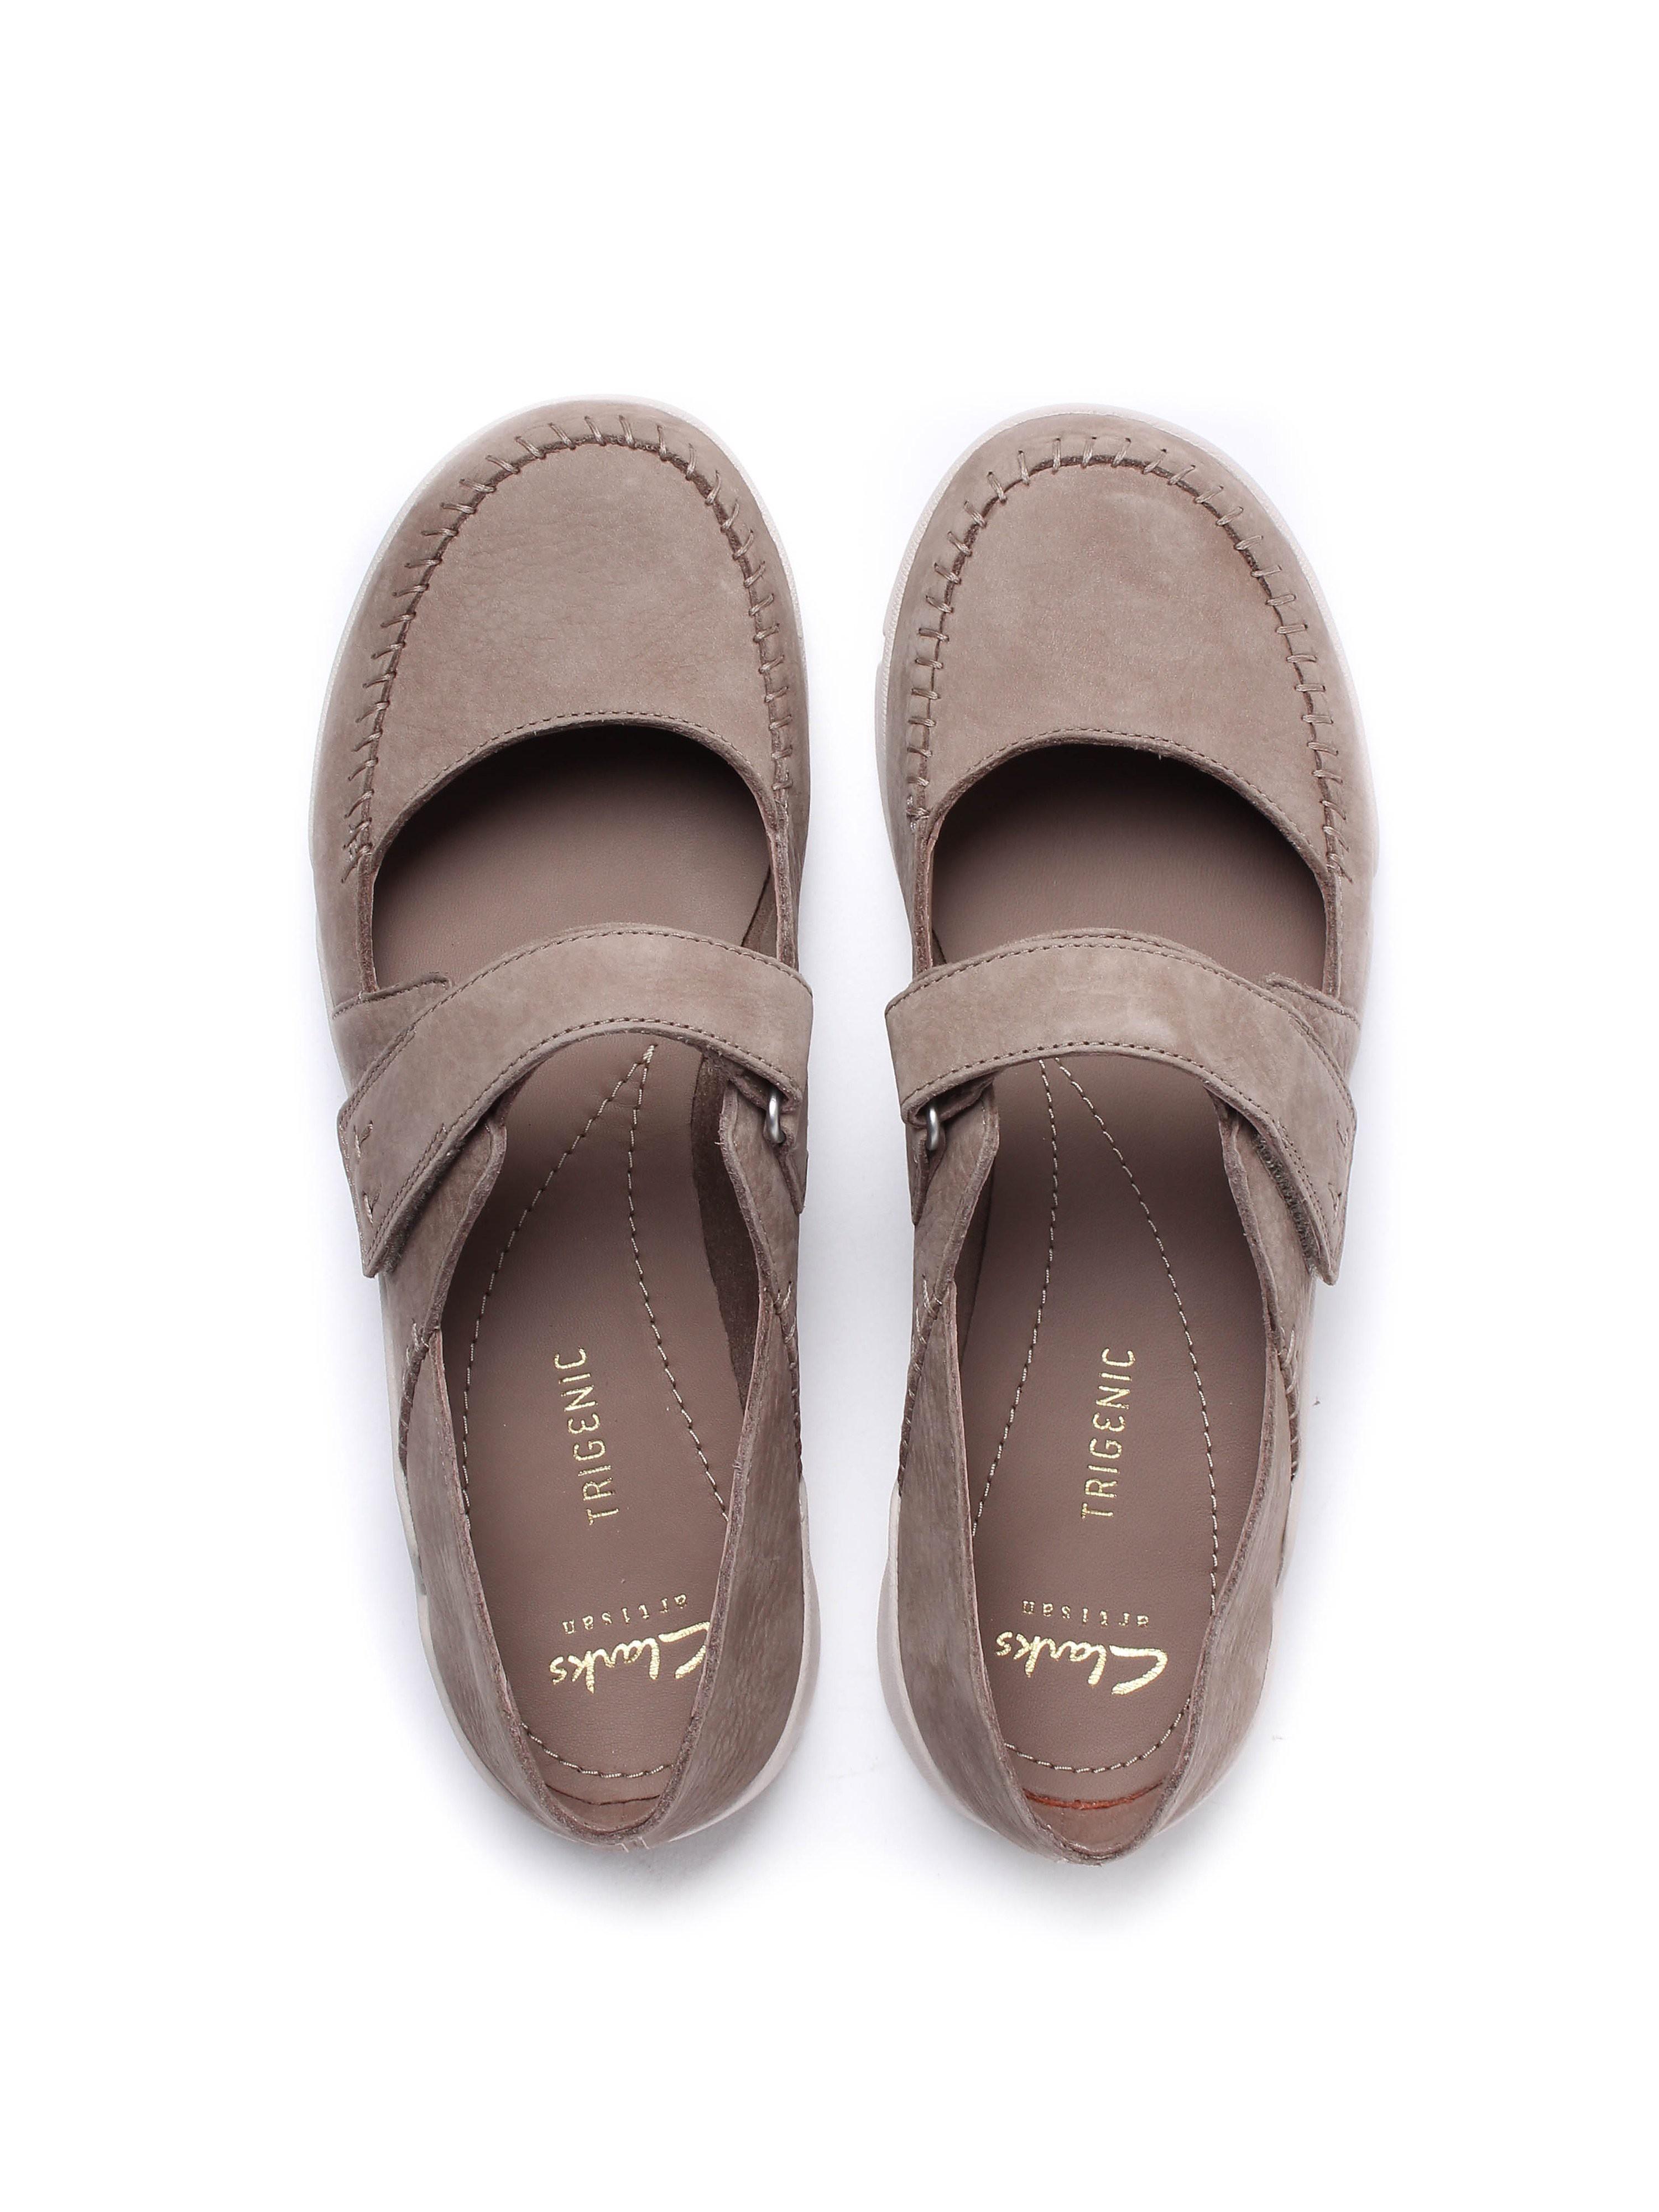 Clarks Women's Tri Amanda Nubuck Shoes - Taupe